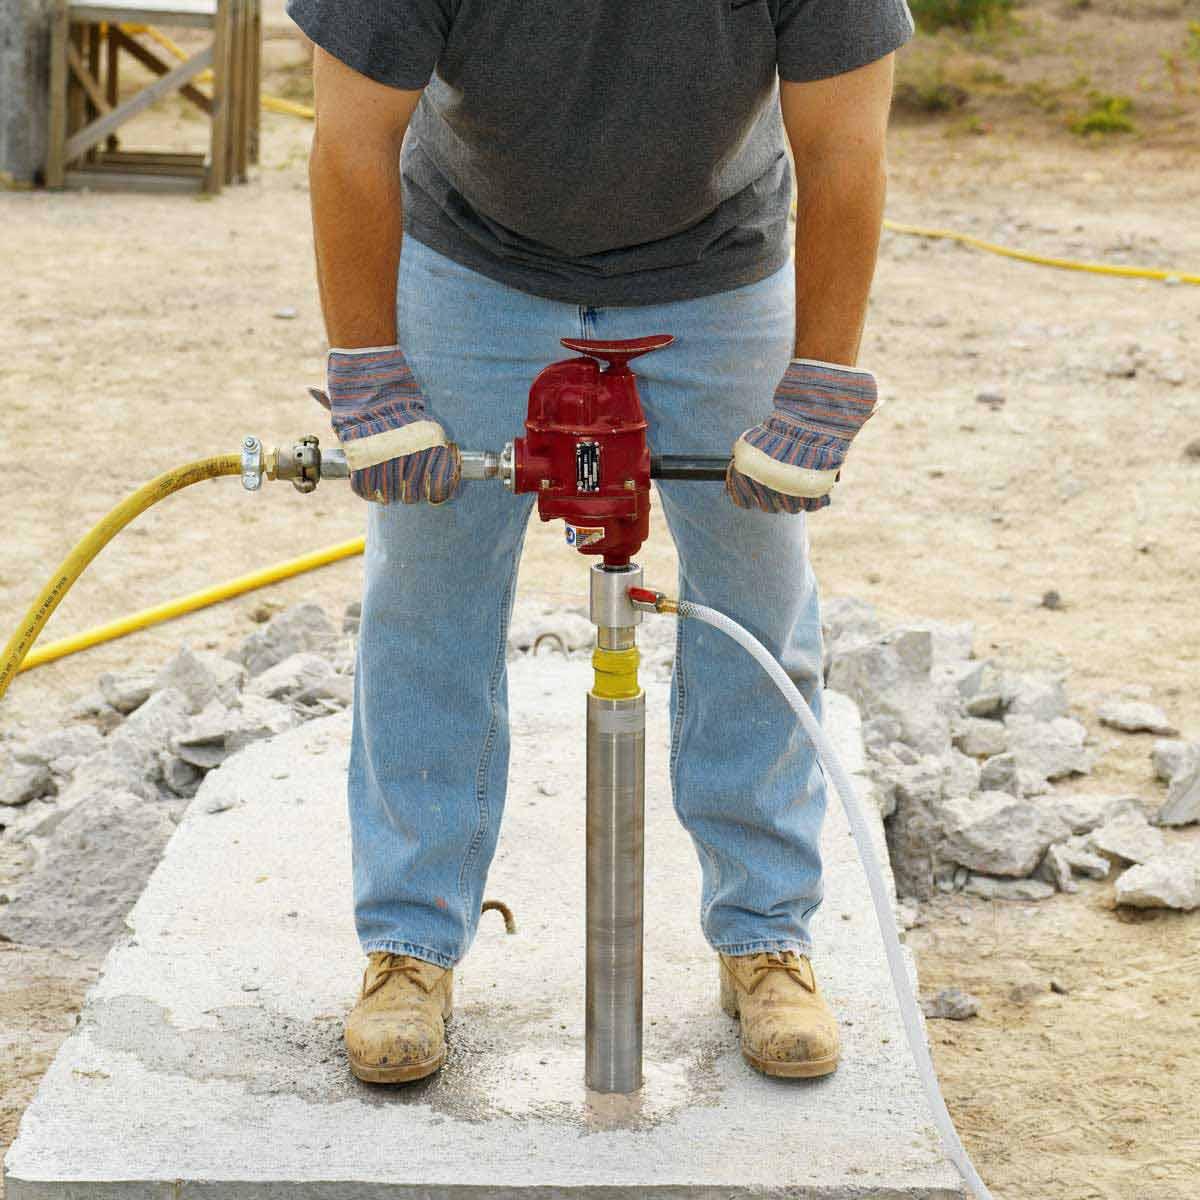 Chicago Pneumatic heavy Core Drill